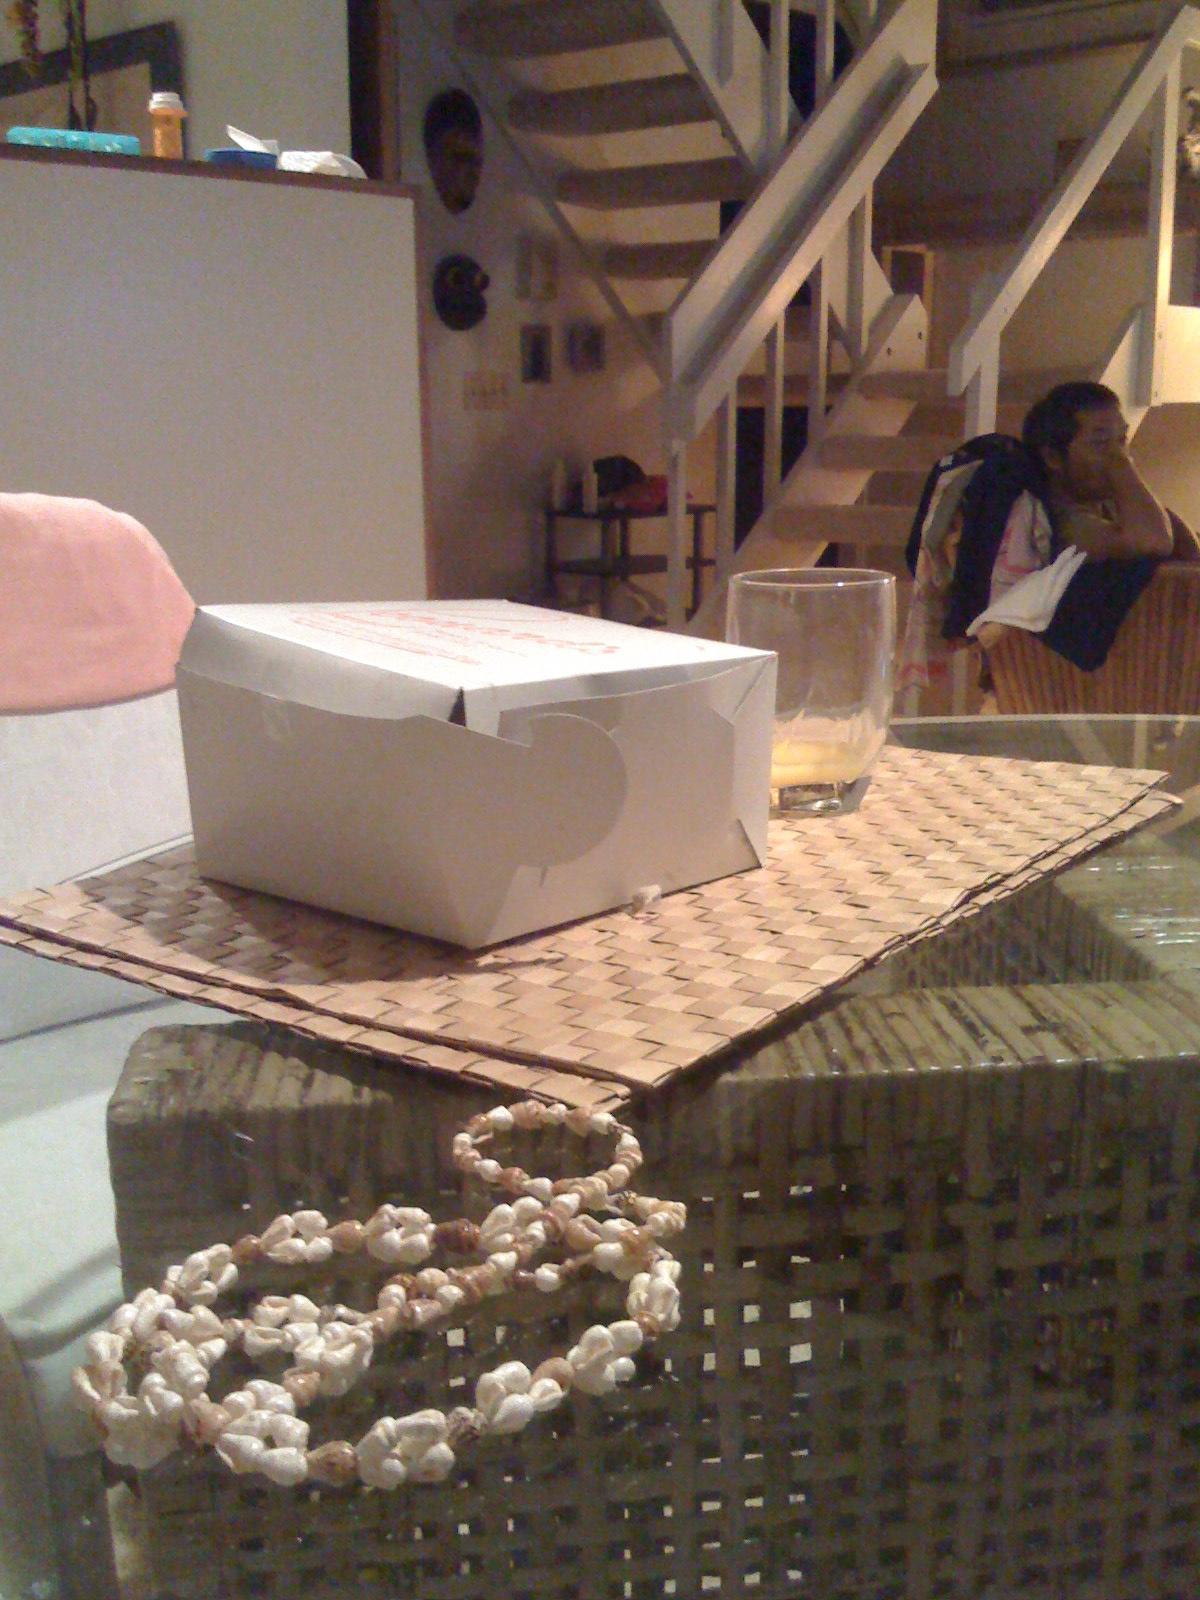 leonard's malasadas--a half empty box